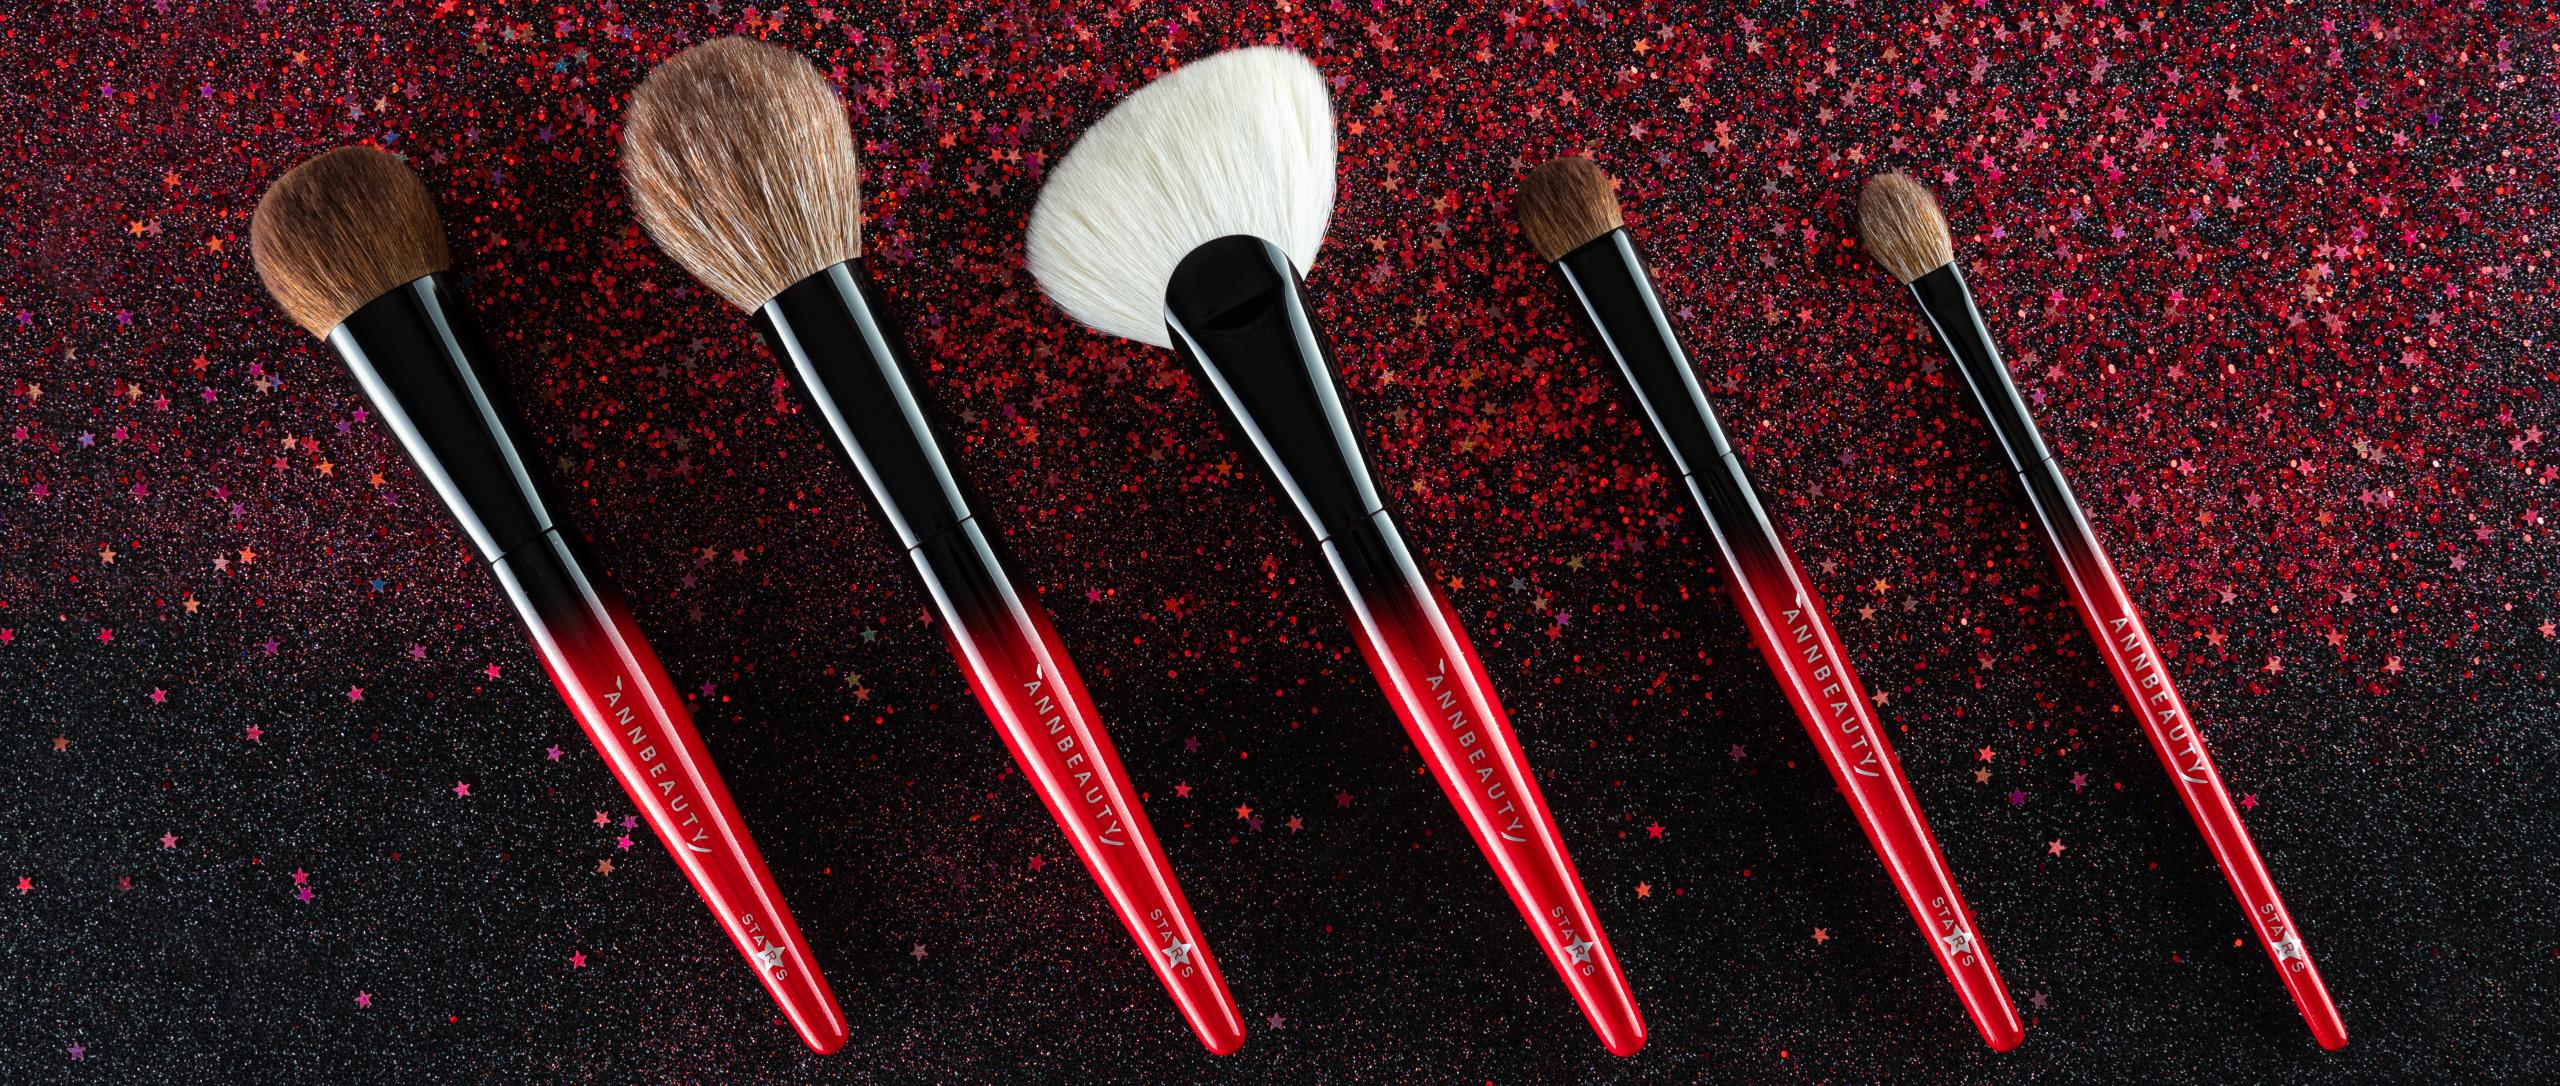 Лимитированная коллекция (набор) кистей для макияжа Annbeauty STARS